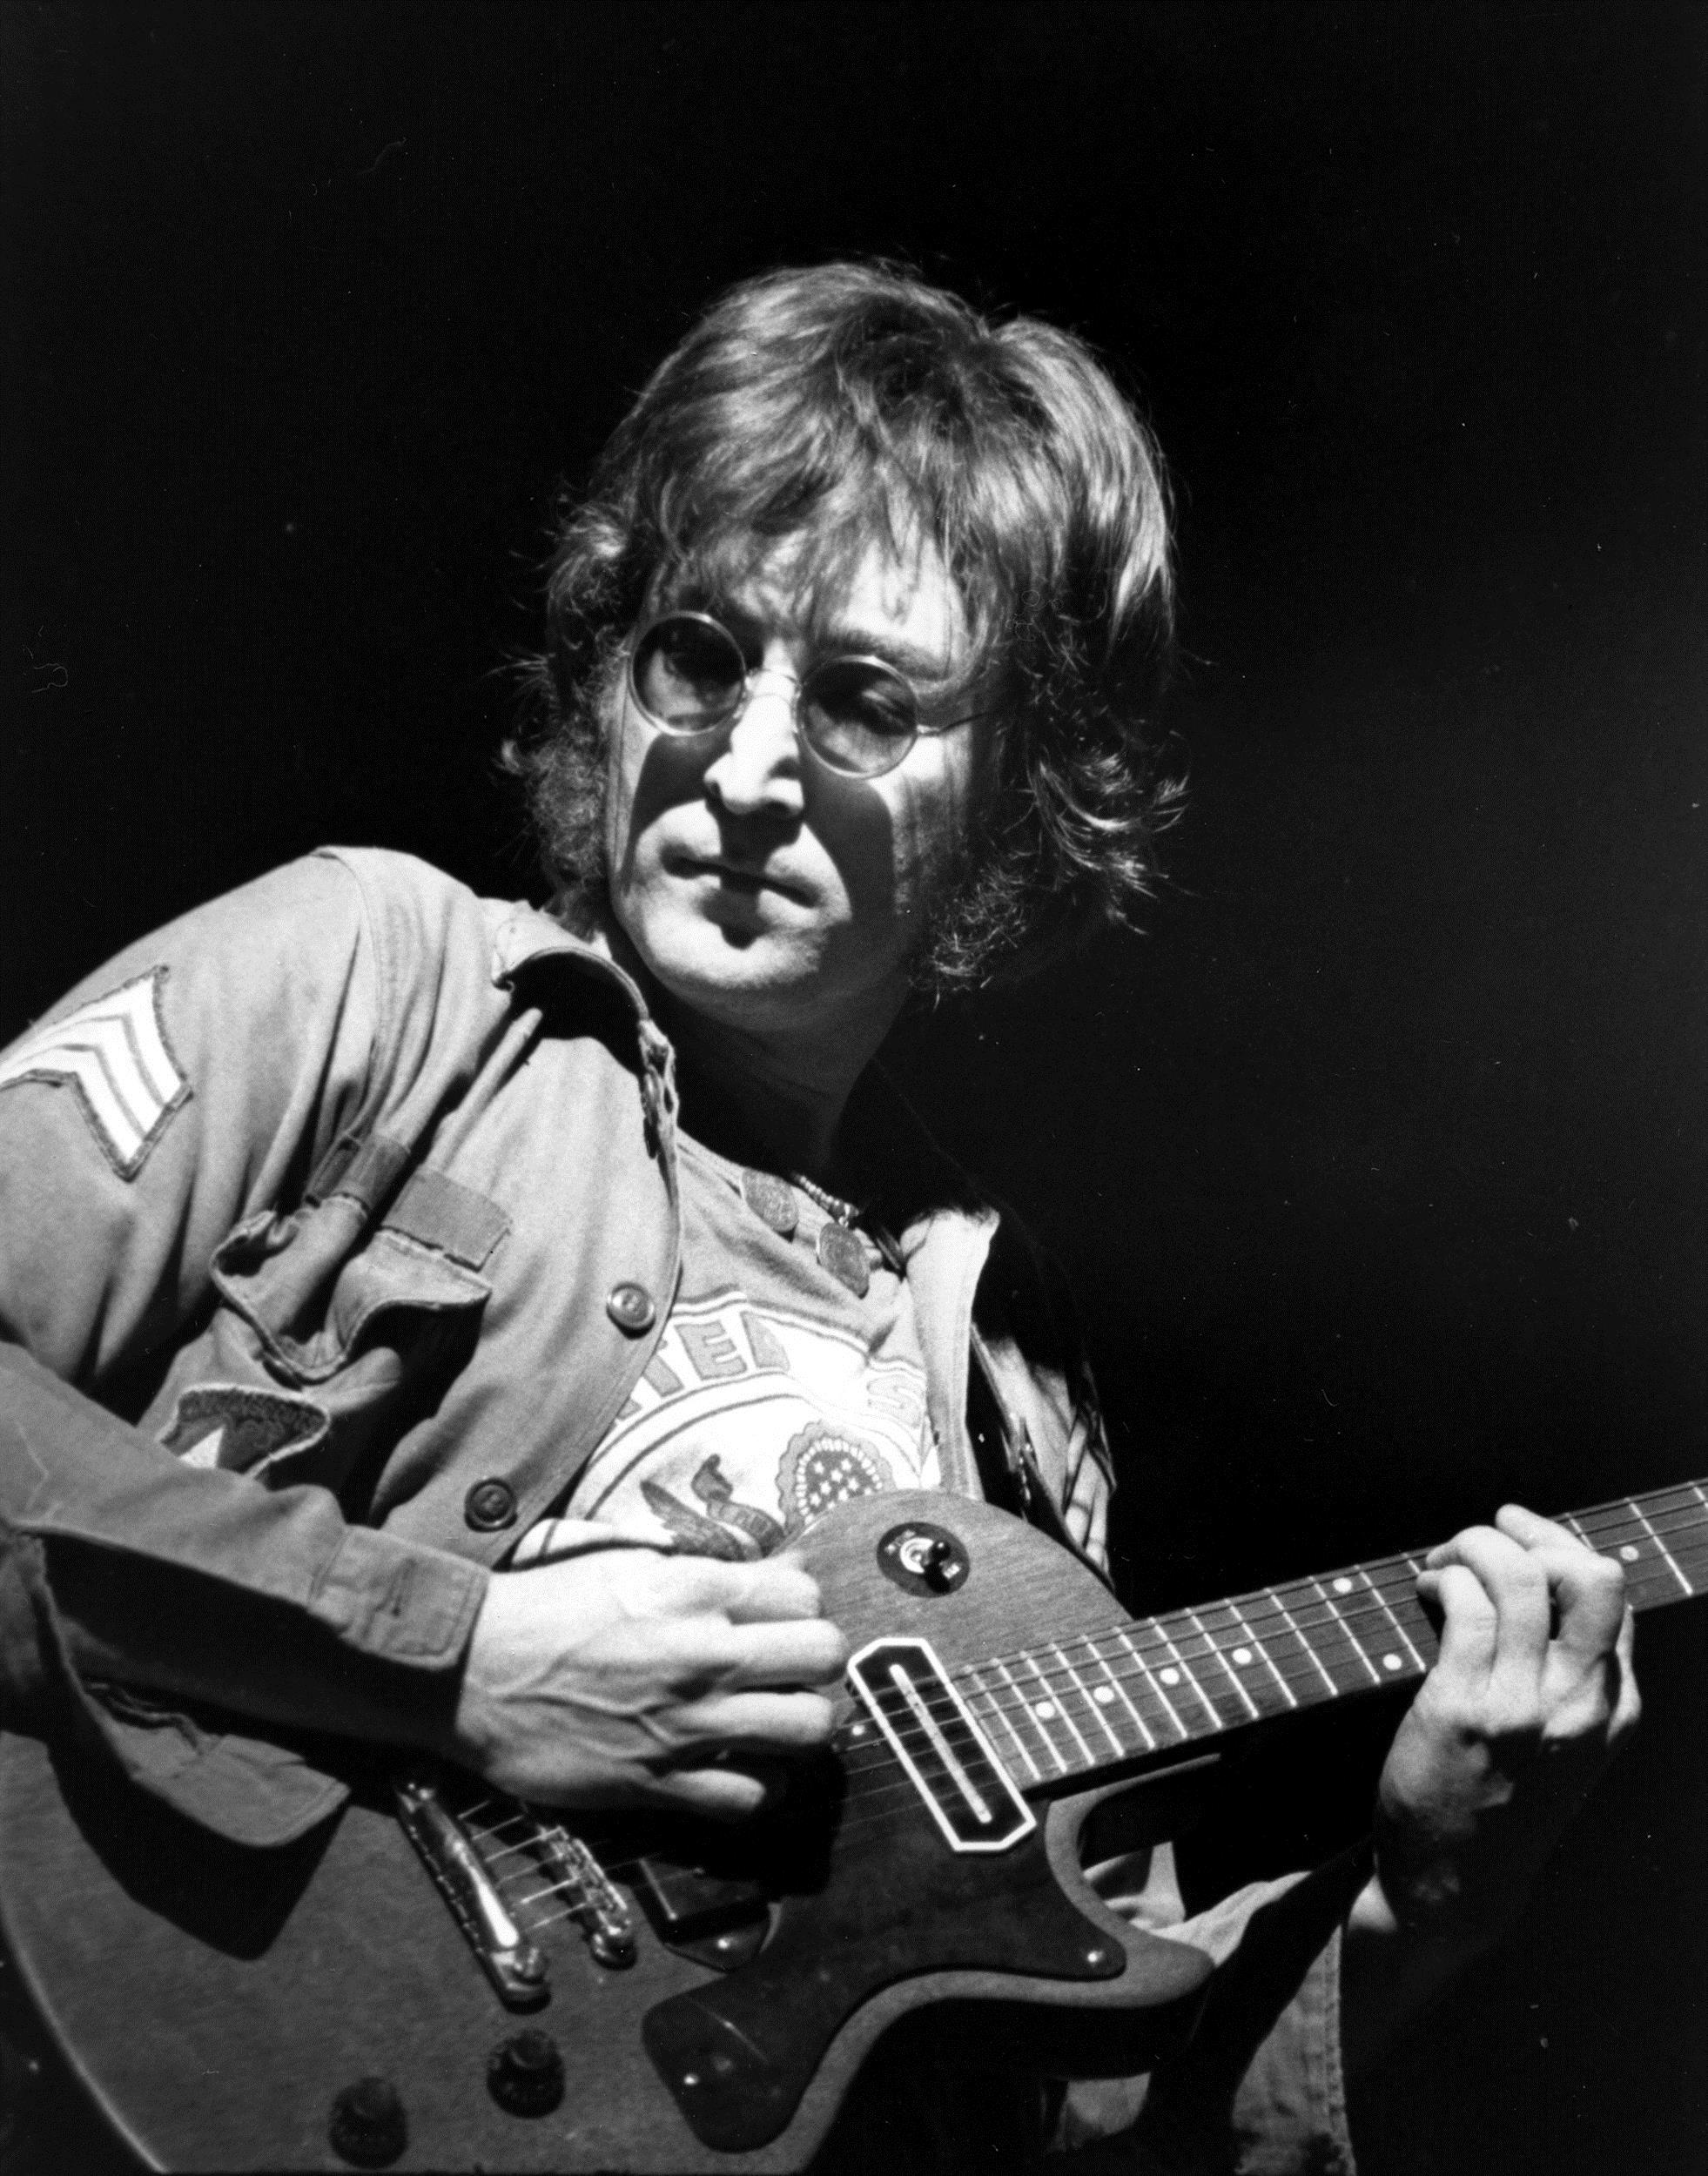 Imagine Researchers Name New Tarantula Species After John Lennon